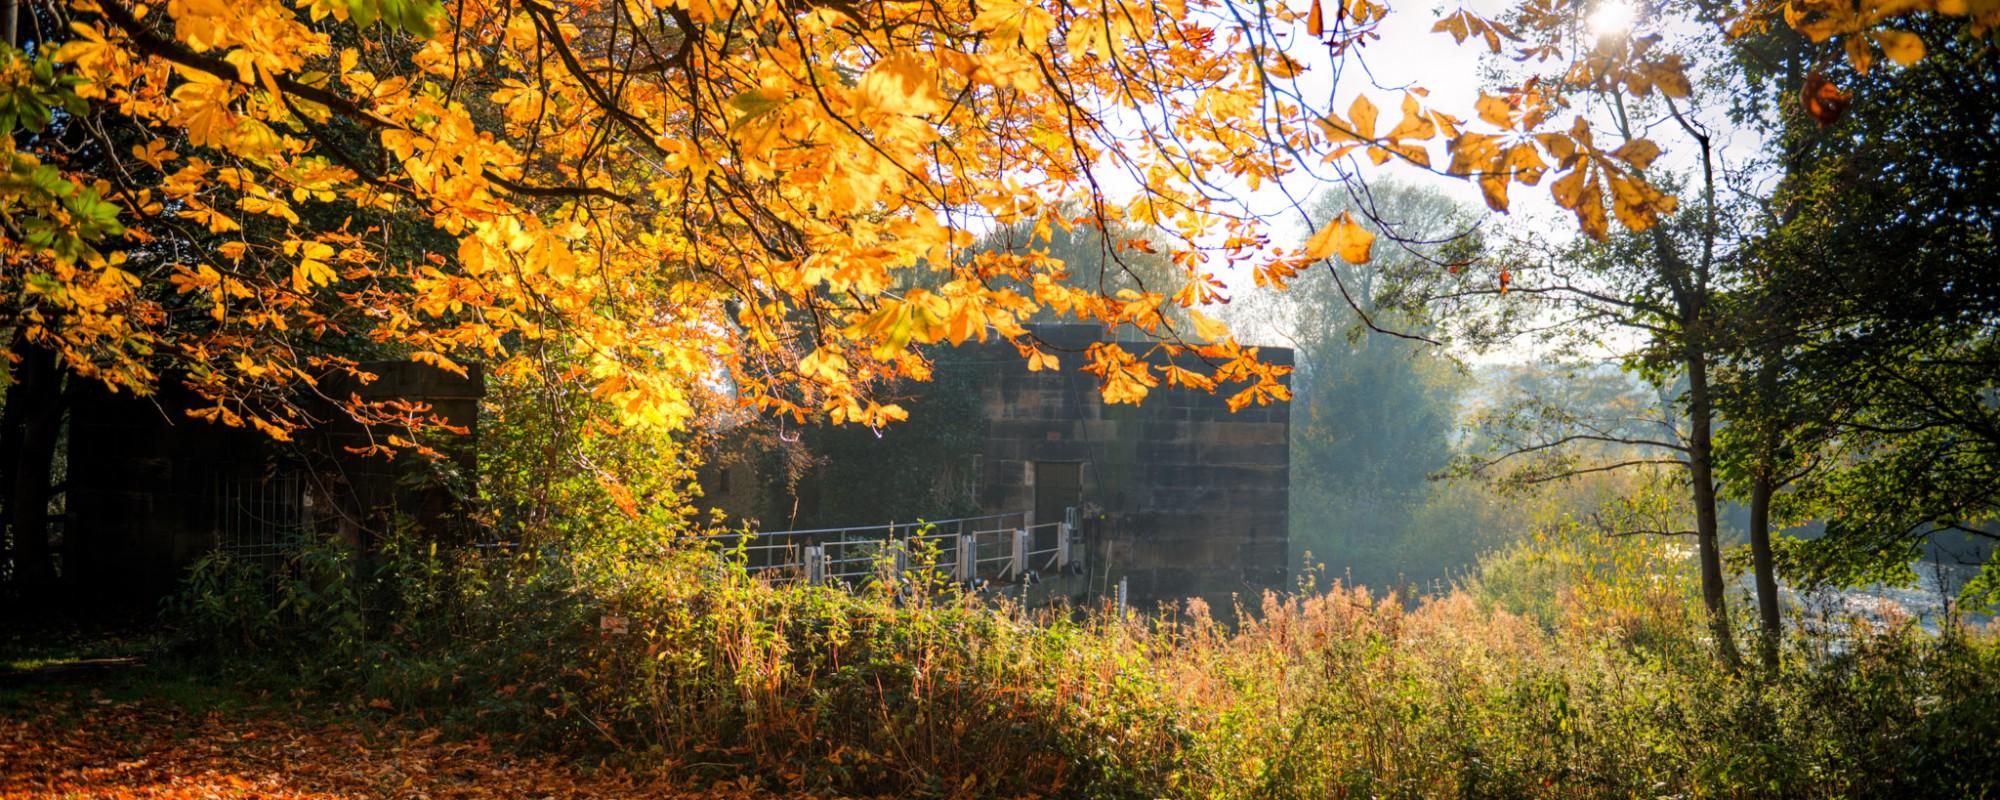 Kirkstall autumnal scene with golden orange leaves